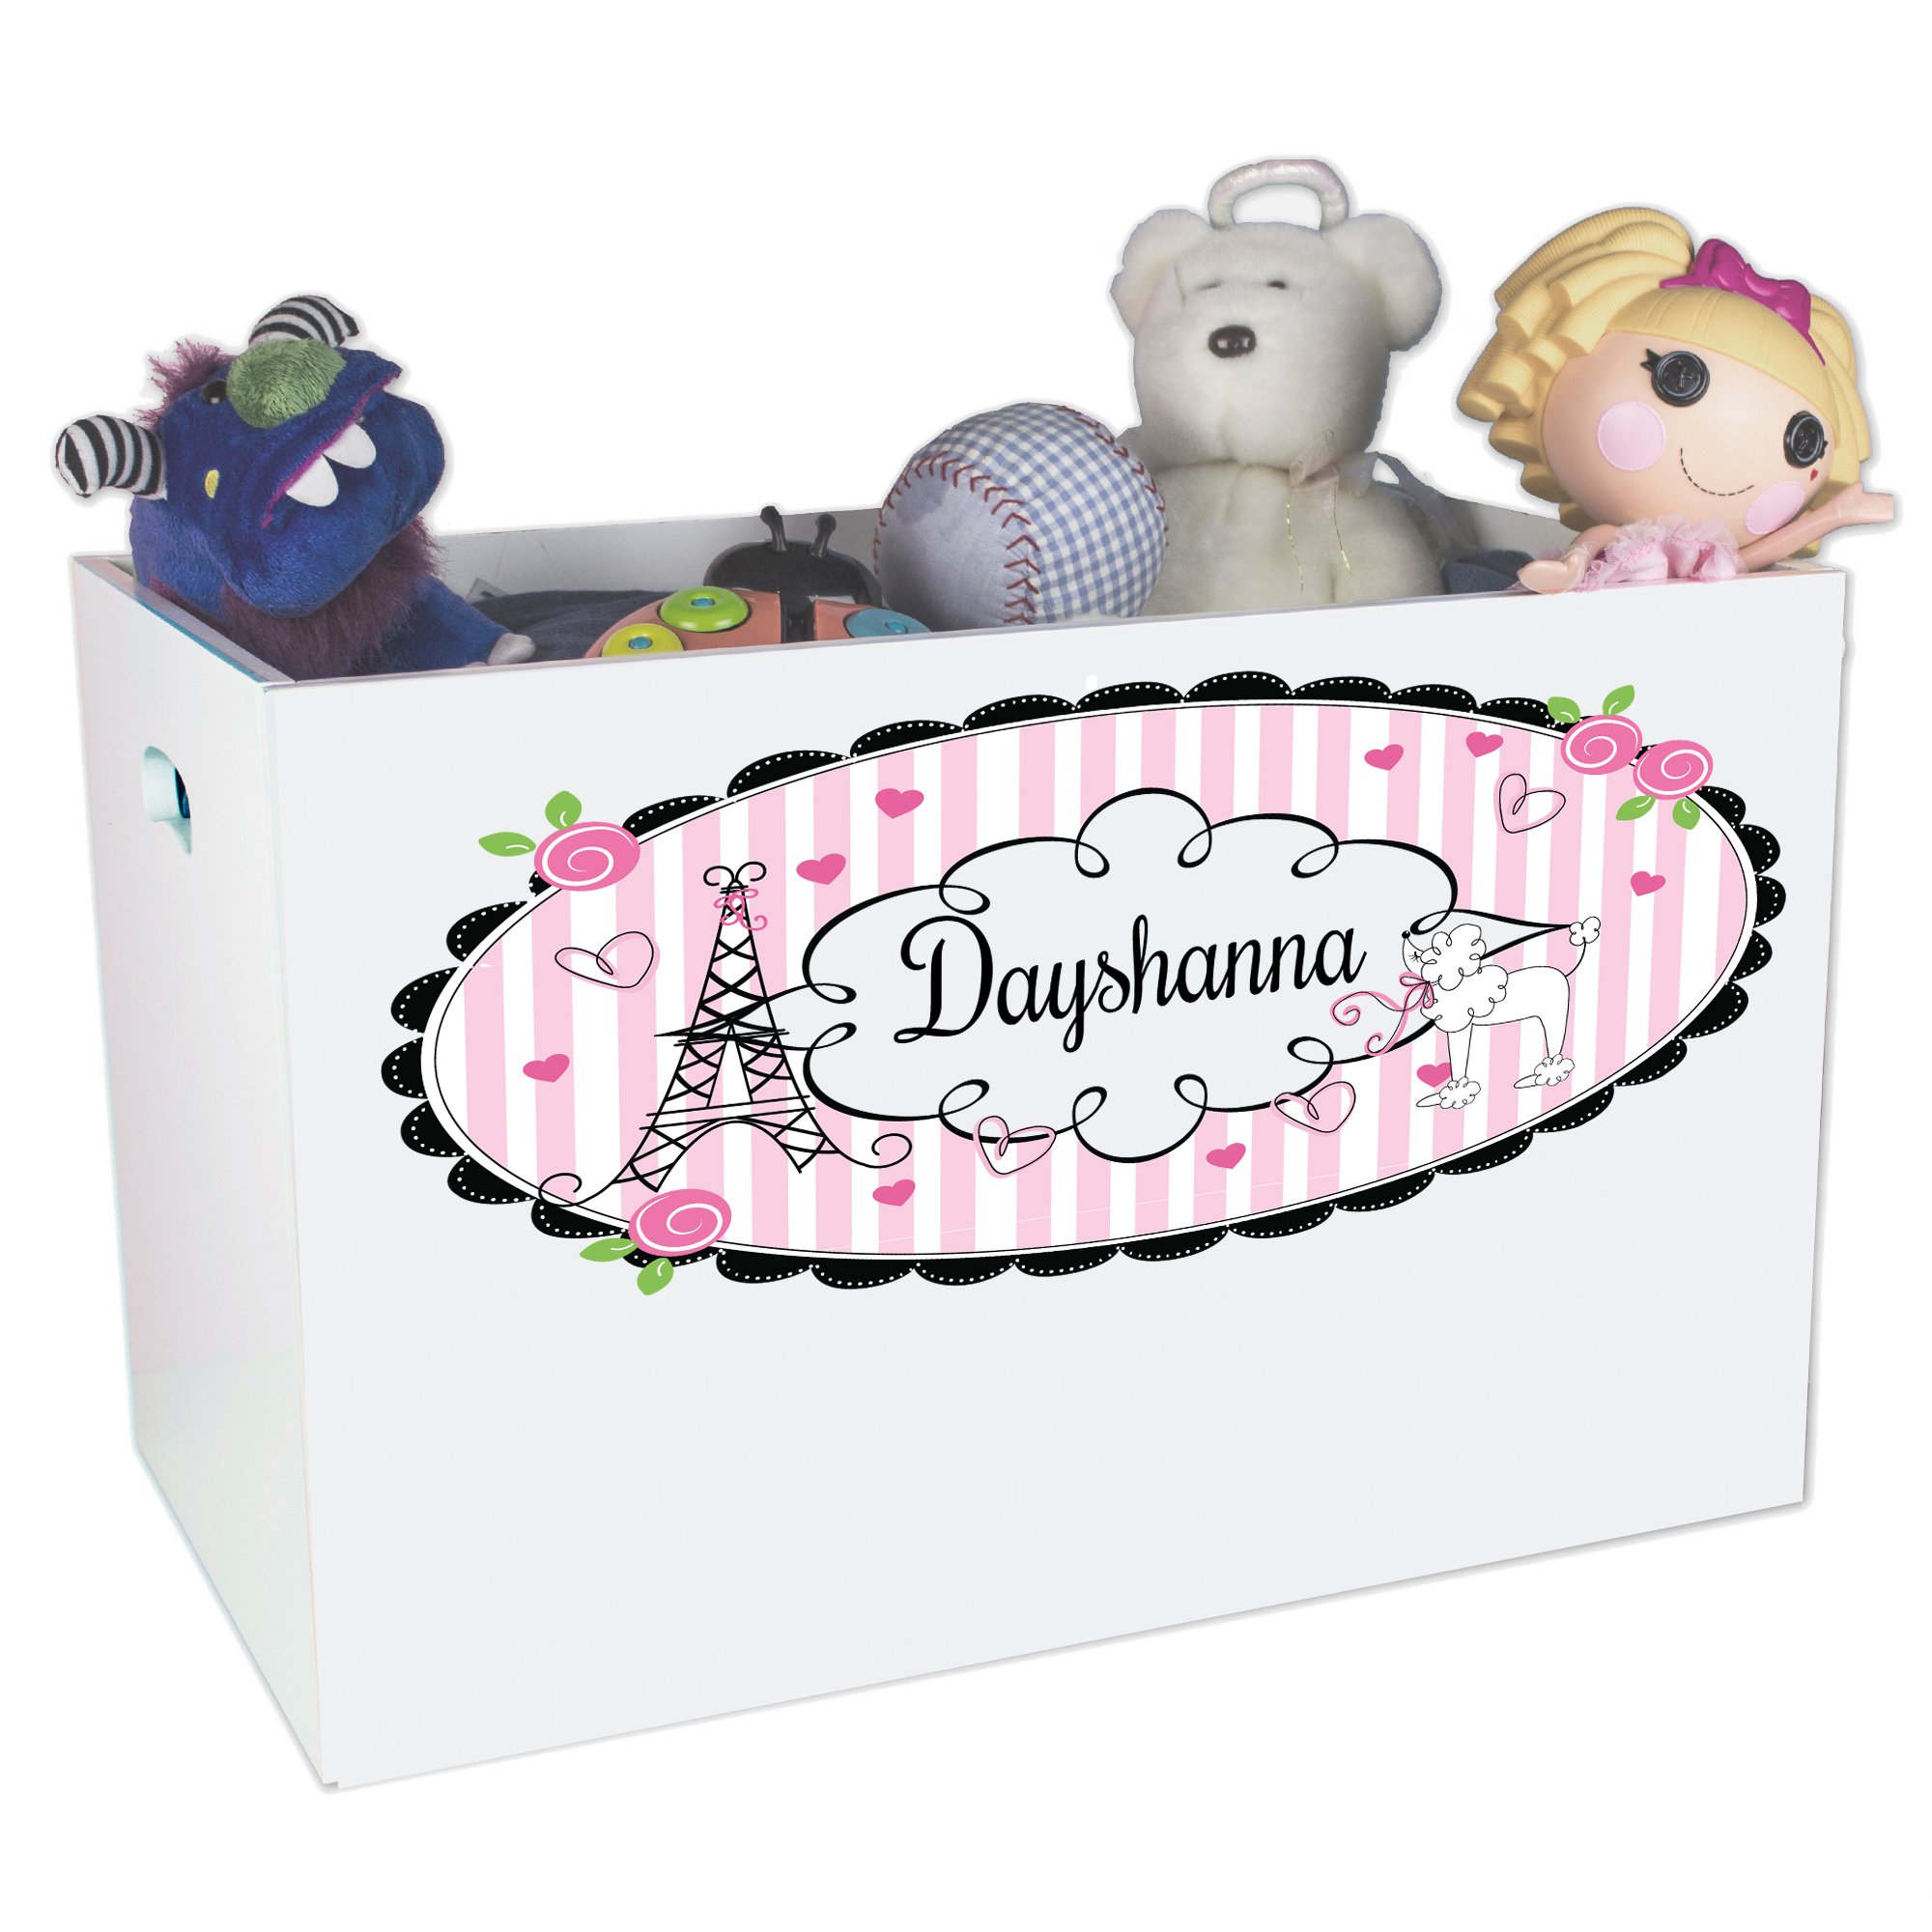 Personalized Paris Childrens Nursery White Open Toy Box